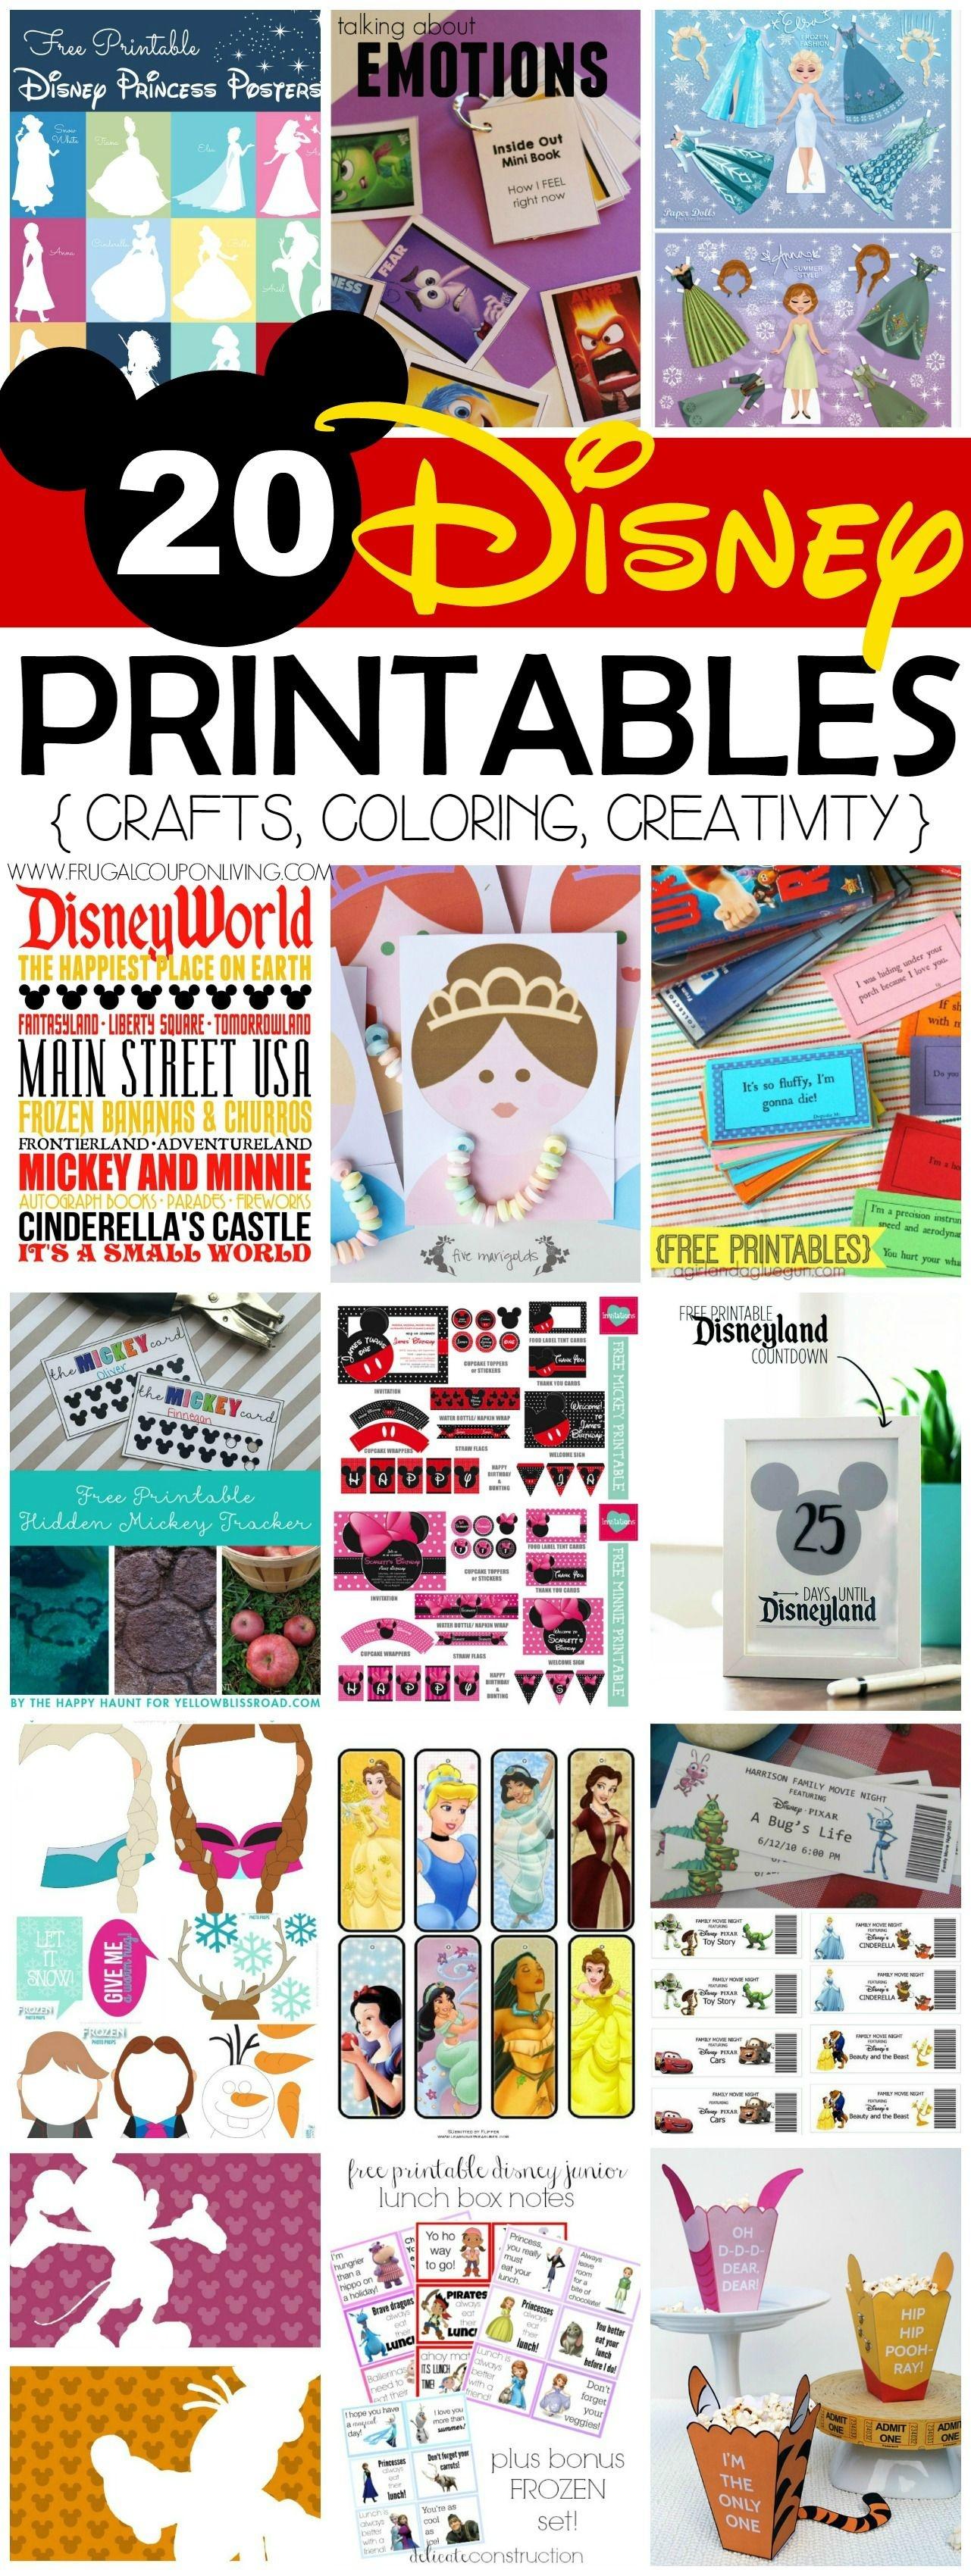 20 Free Disney Printables - Crafts, Coloring, Creativity | Disney - Free Disney Printables